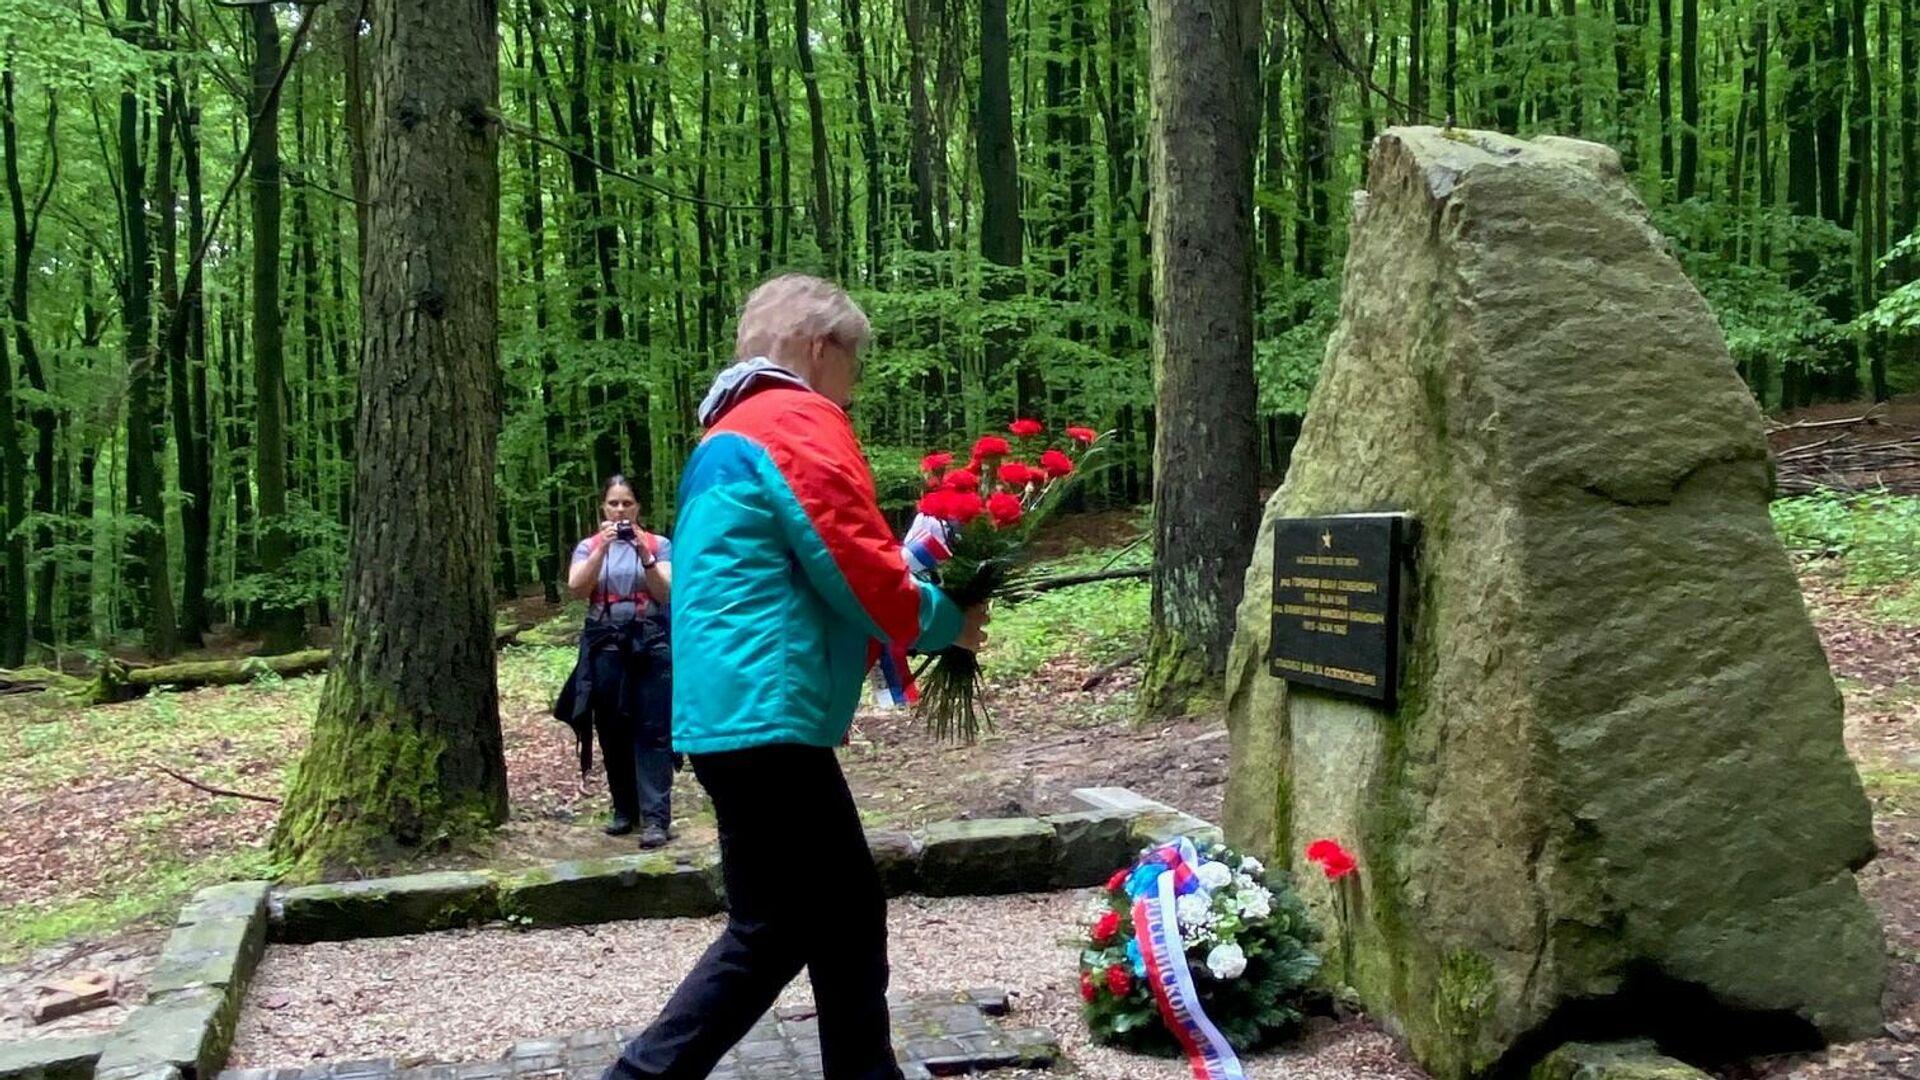 Pamätník vojakov Ivana Semjonoviča Gorjunova a Nikolaja Ivanoviča Jefimuškina - Sputnik Česká republika, 1920, 17.05.2021